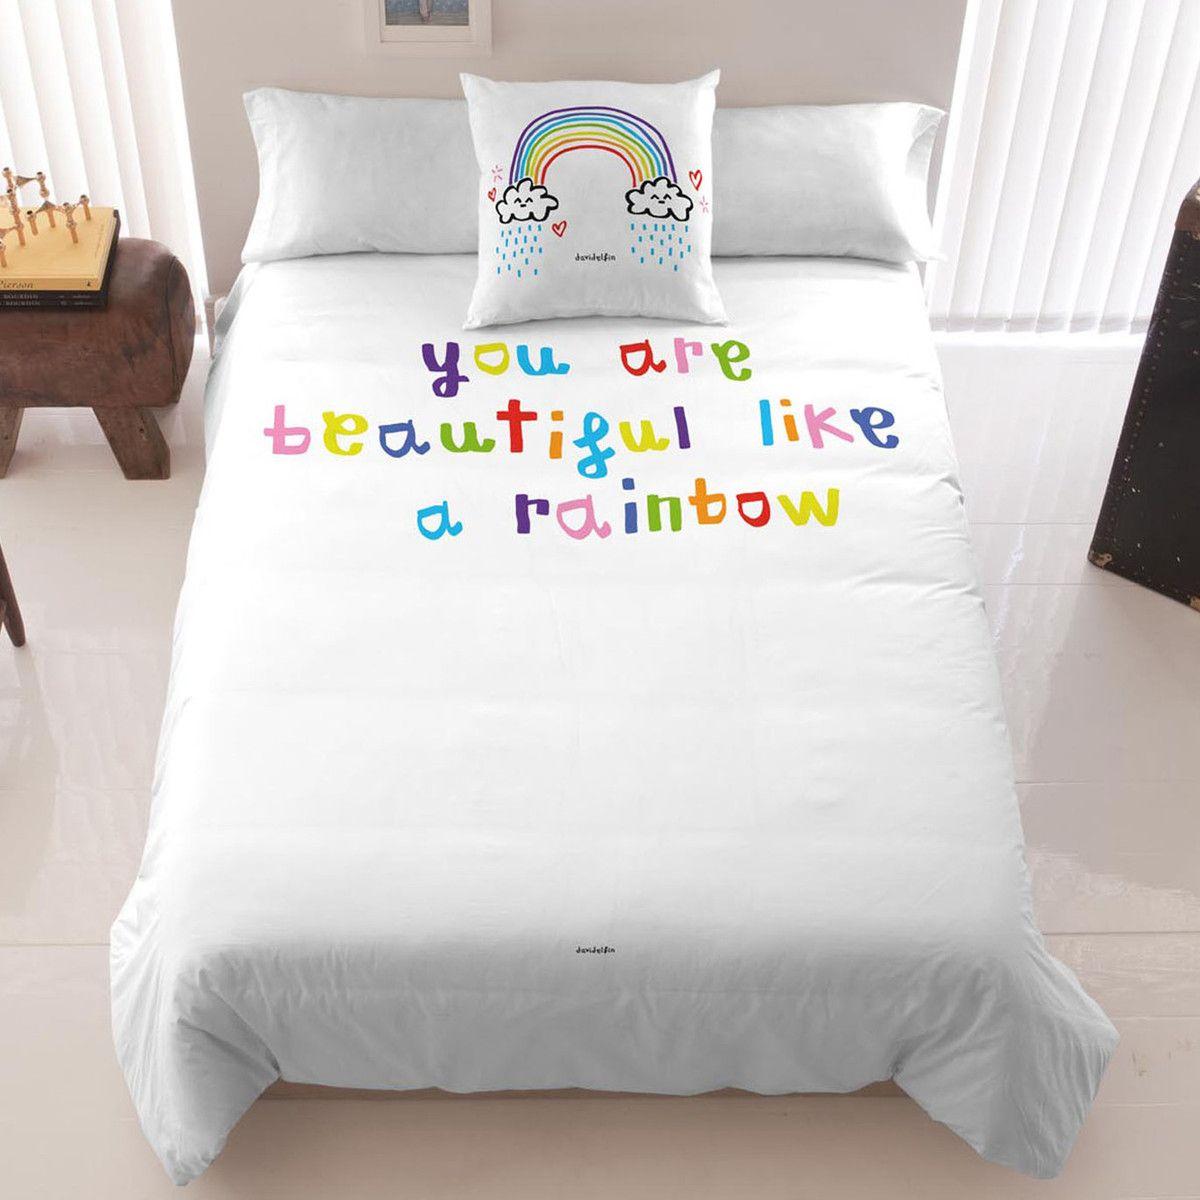 Rainbow duvet lovely 4 my girl pinterest cosas for Cosas de casa deco